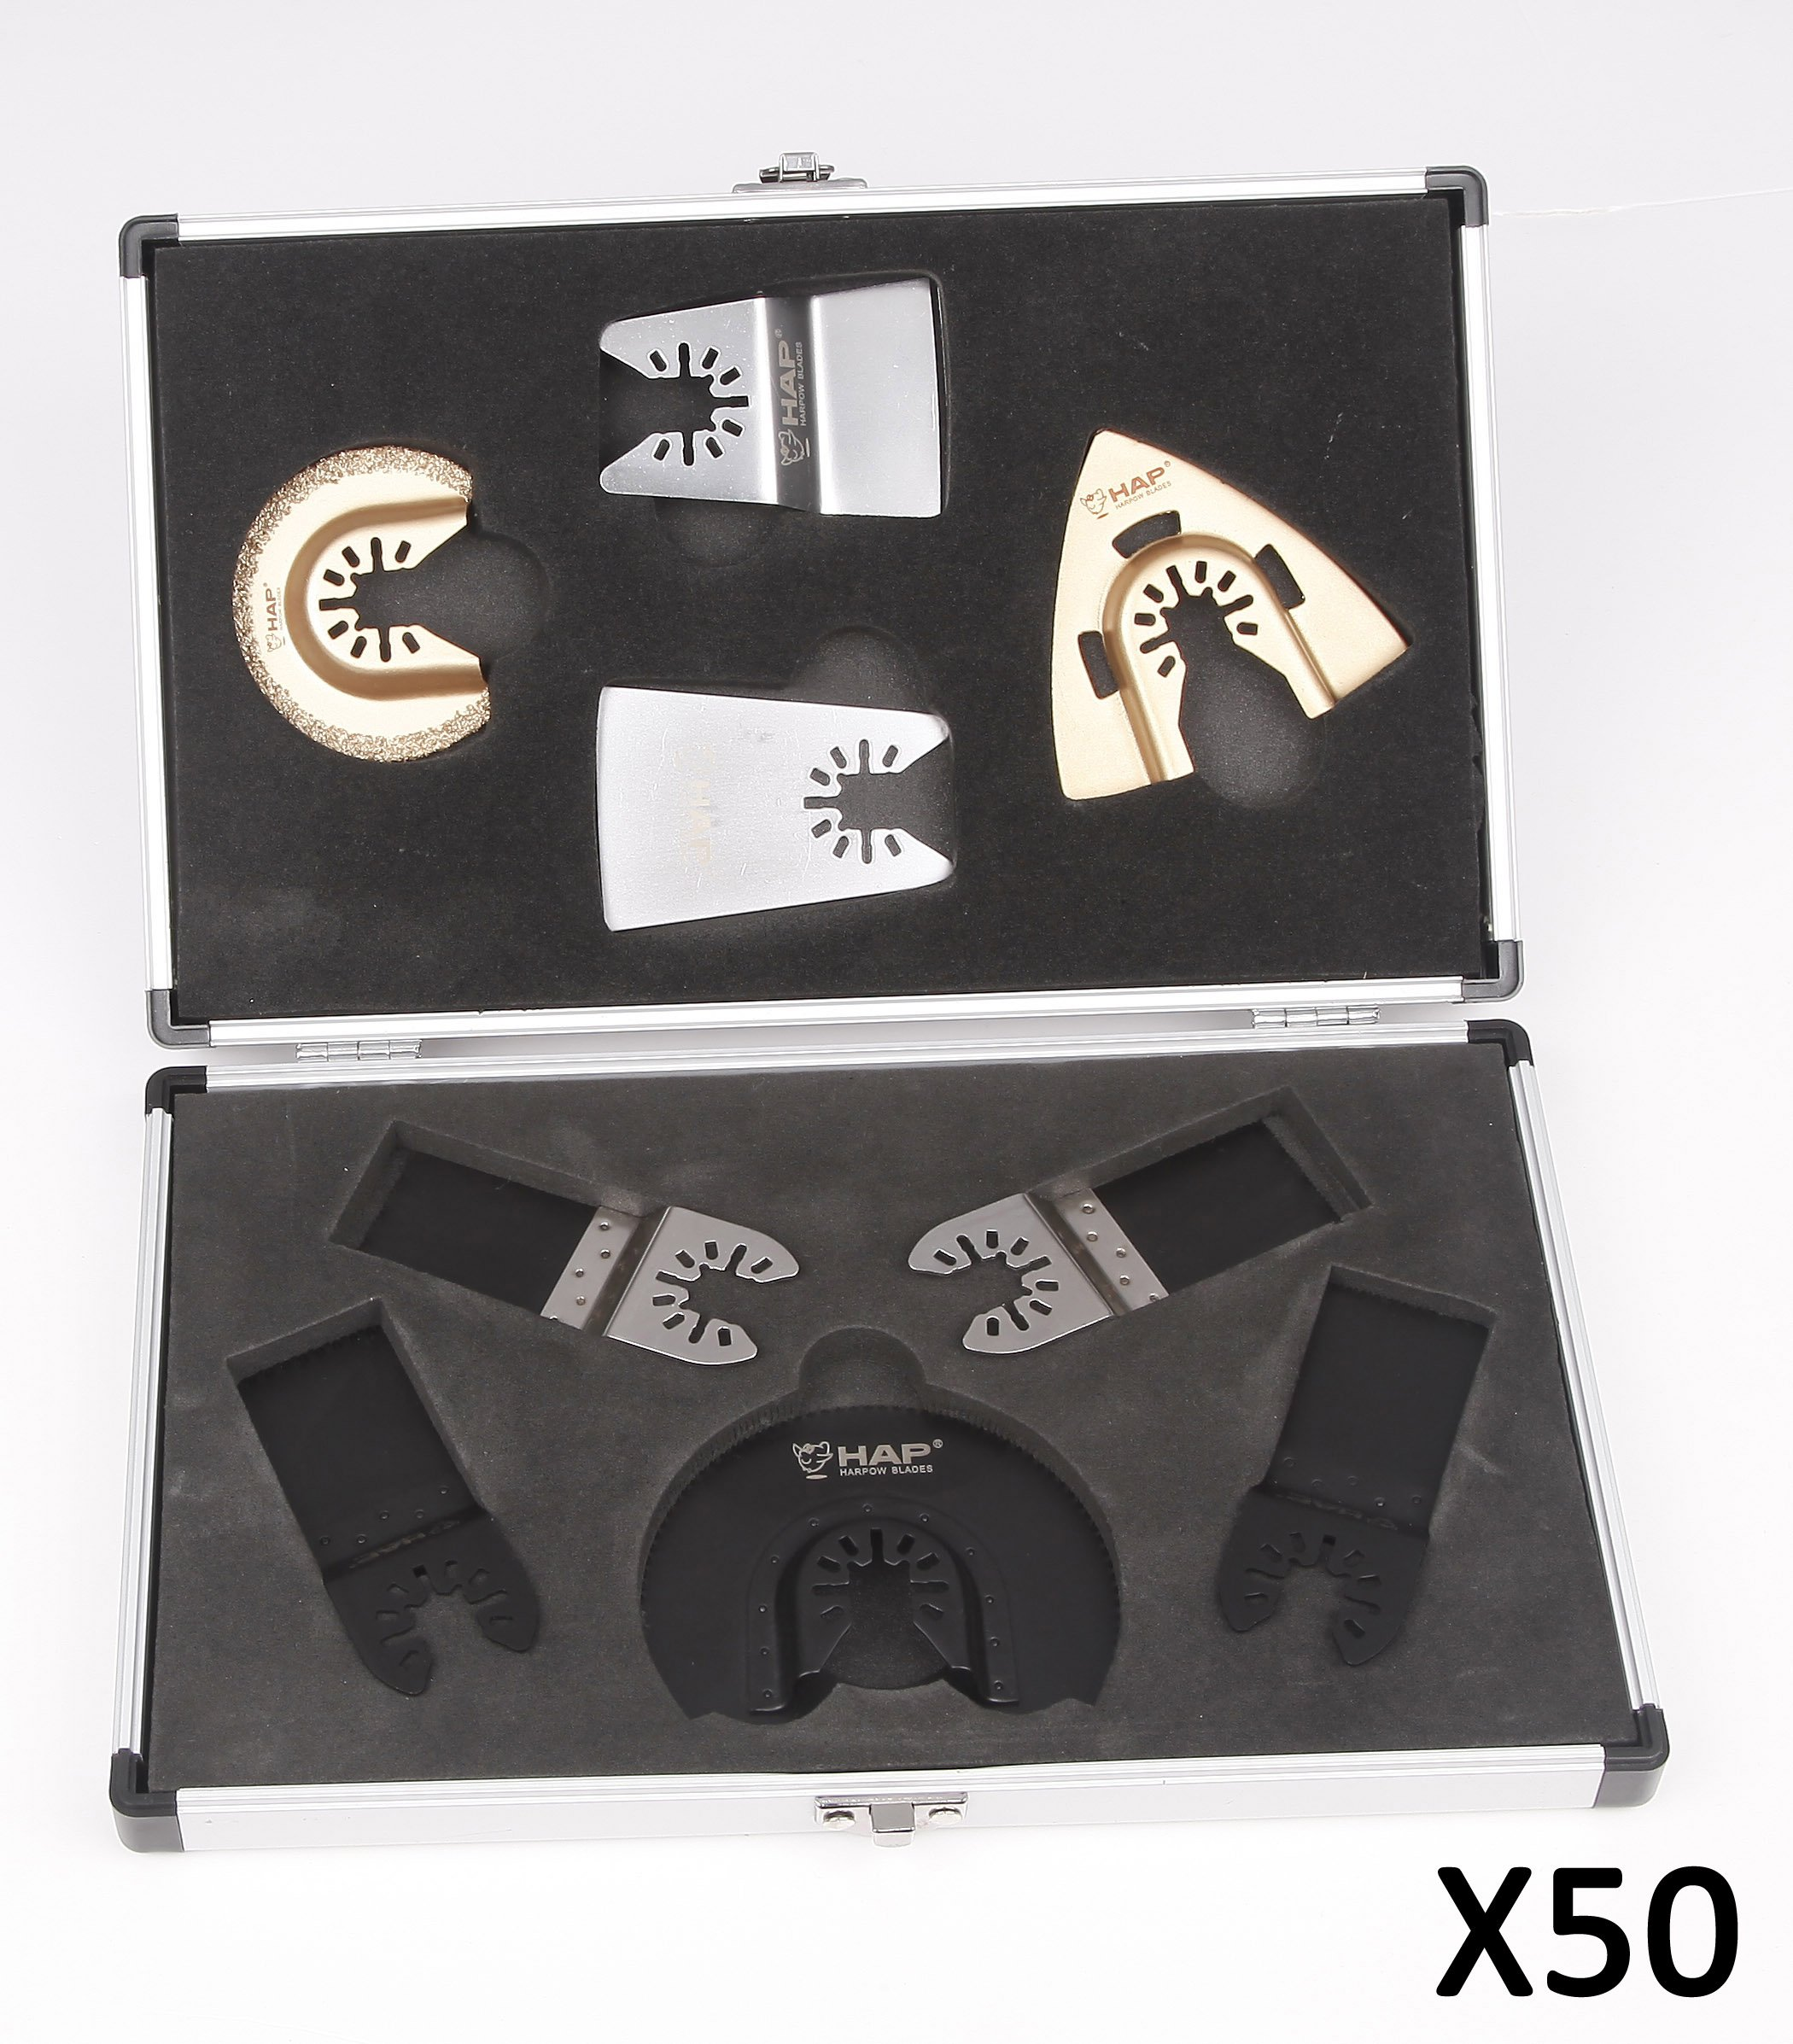 Harpow 9pcs Aluminium Case Set,power Oscillating Tool Blades,multitool Blades,power Tool Saw Blades,fits Fein Bosch Craftsman Rockwell Einhell Westfalia Ferm Pro-line Matrix Tools, 50 Pack